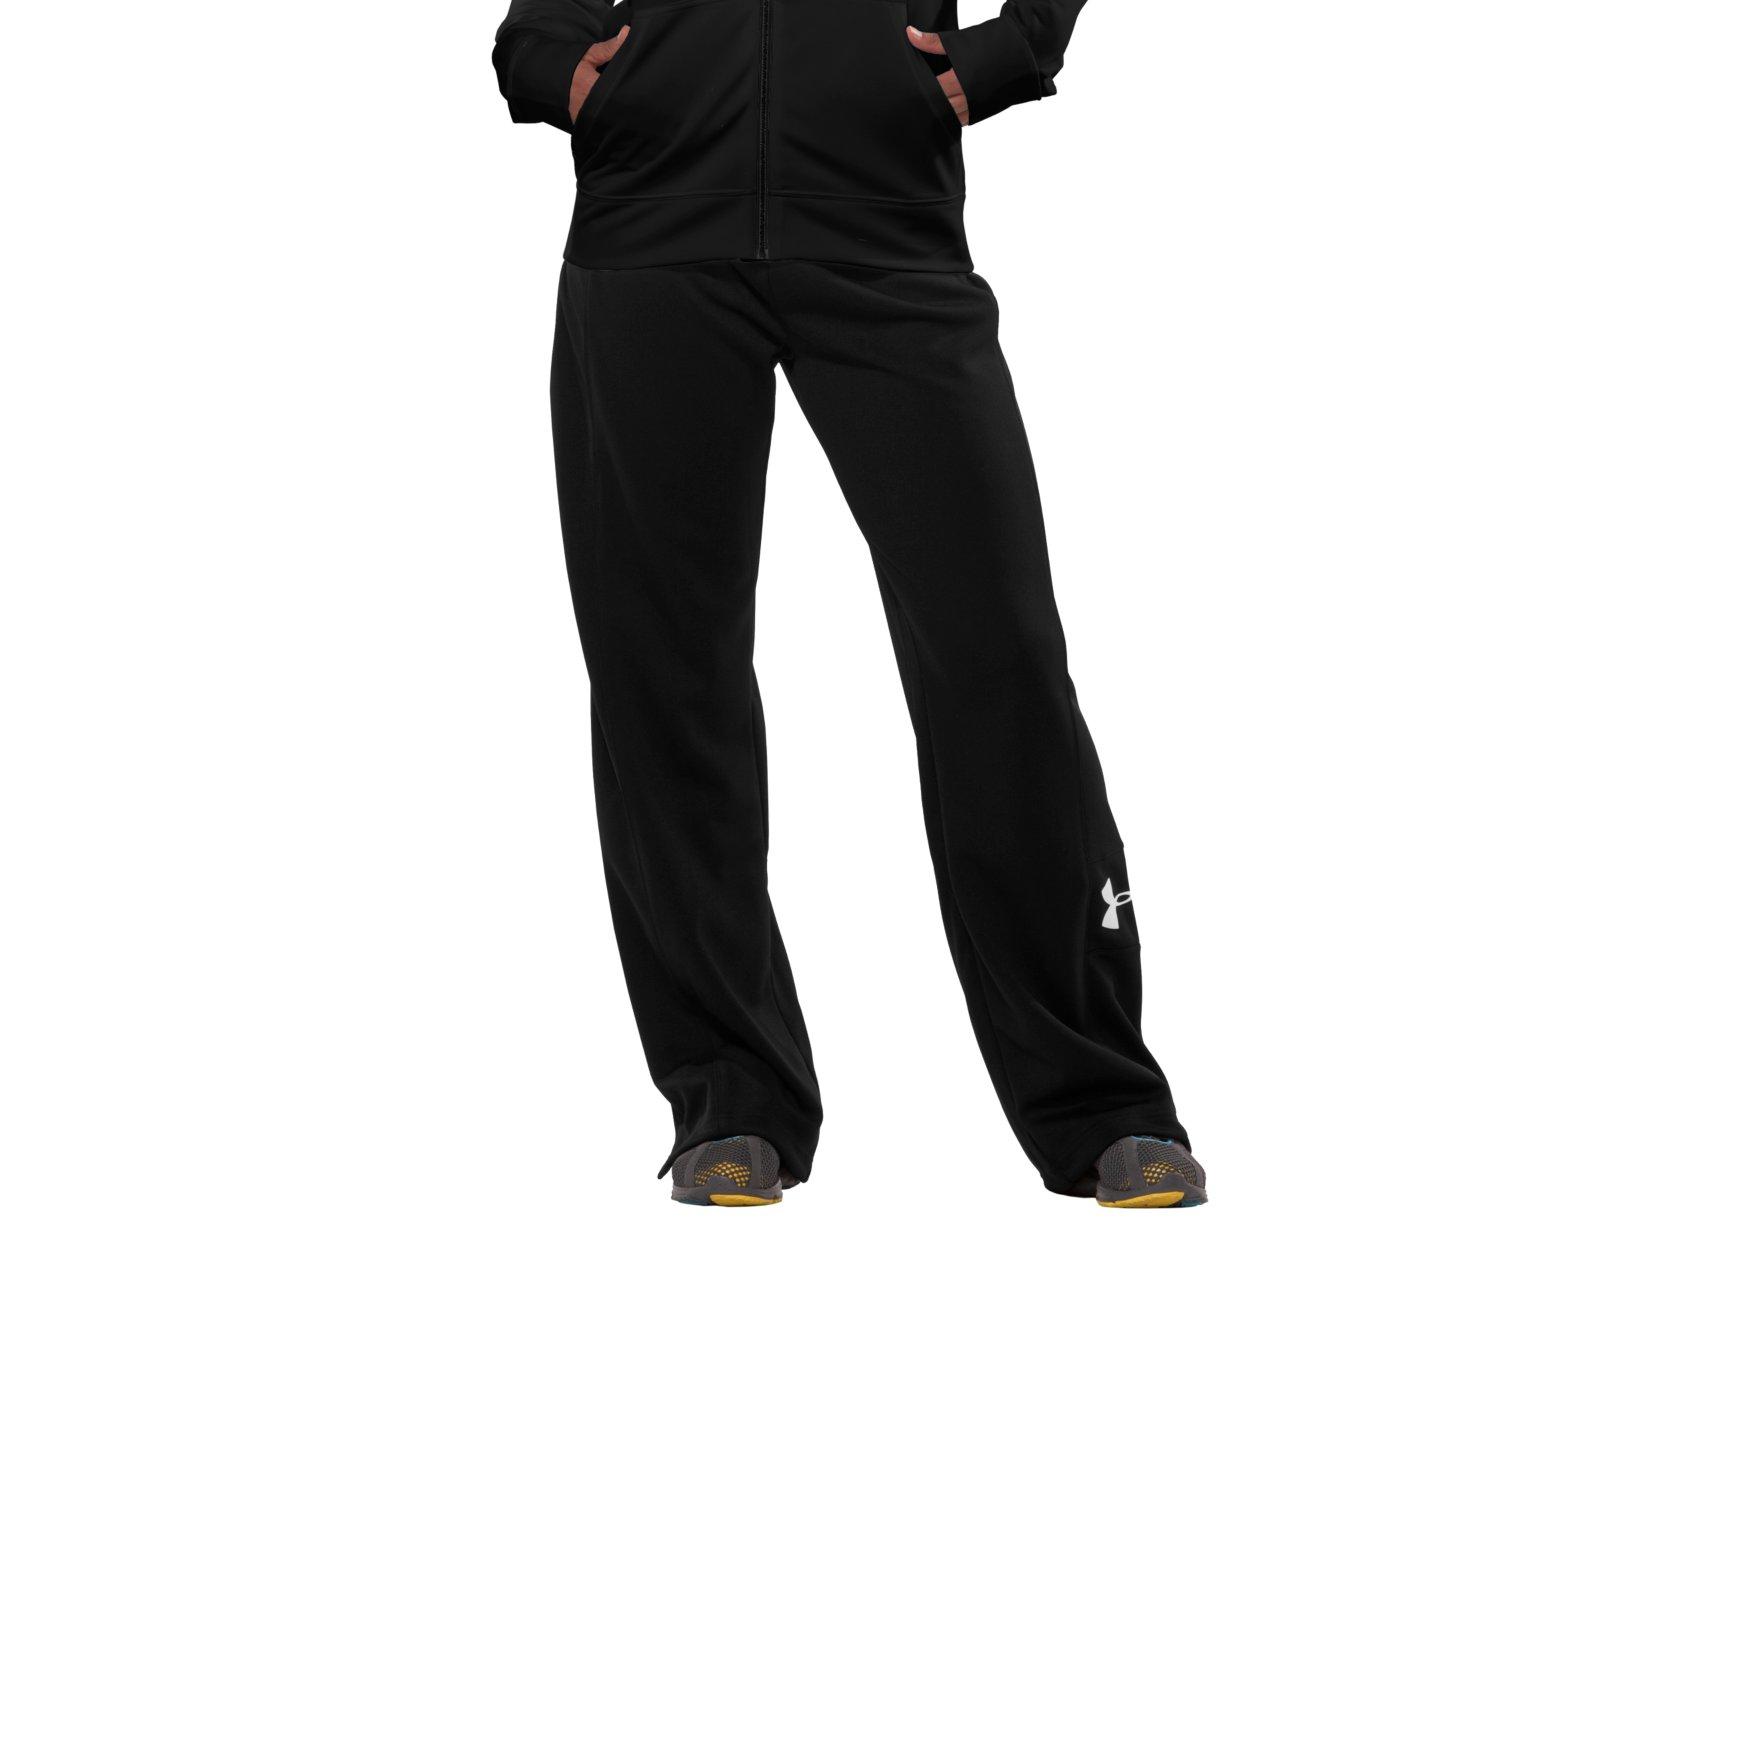 4ba3ac573c8bd Emily Asks About Women's UA Hero Warm-Up Pants - Needle